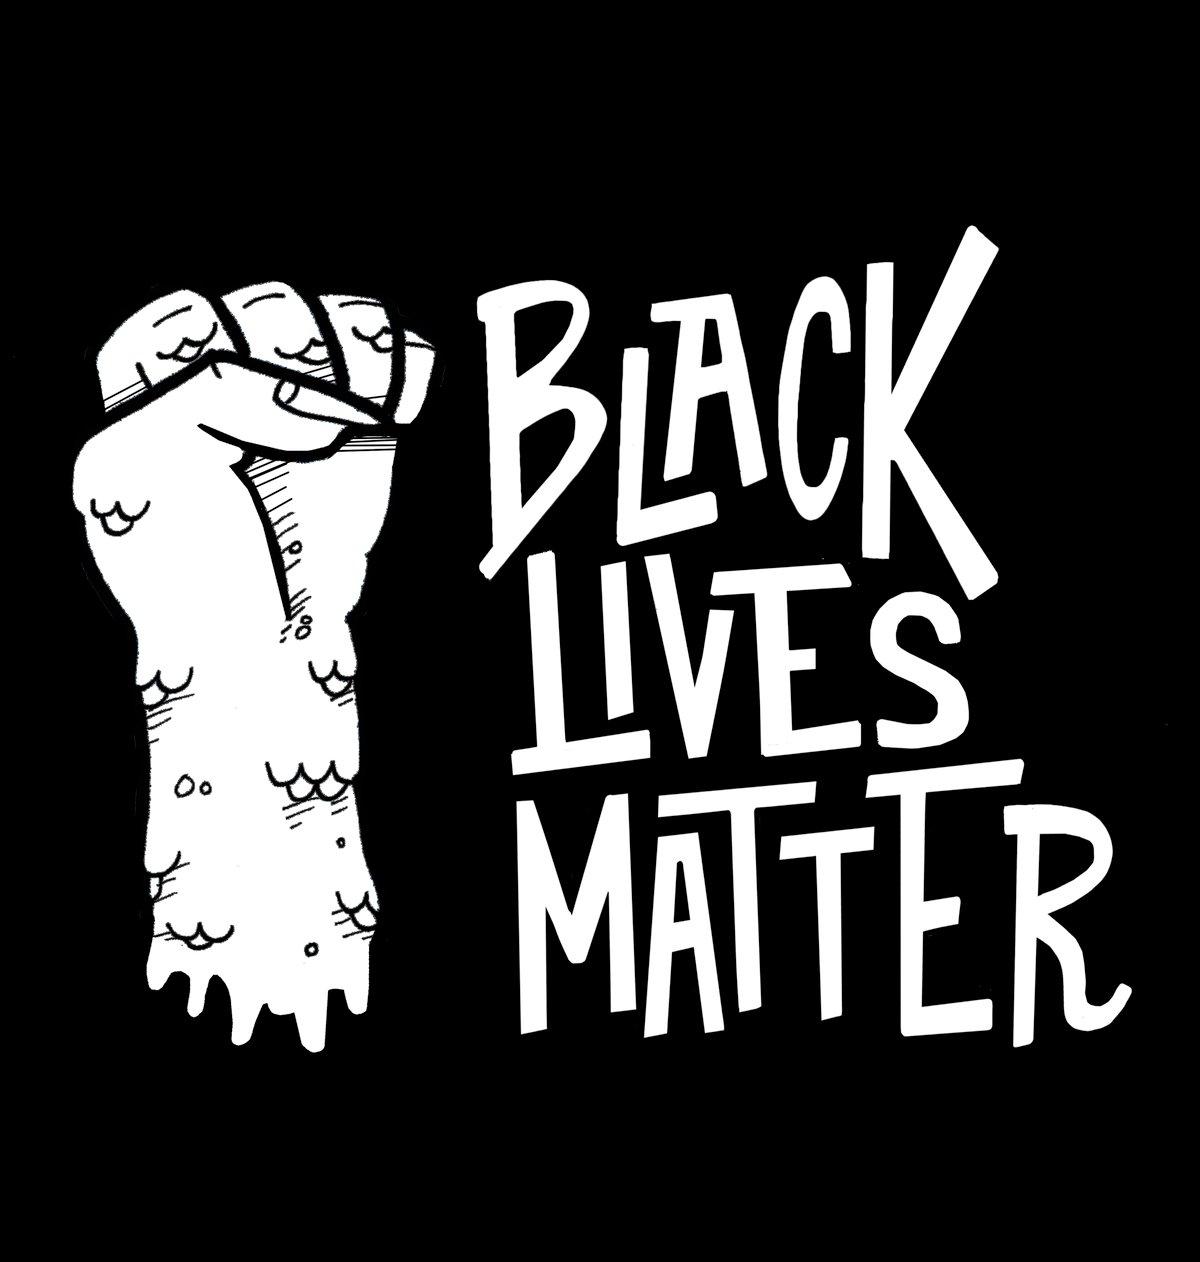 BLACK LIVES MATTER Charity Fundraiser Men's & Women's Limited Edition T-Shirts